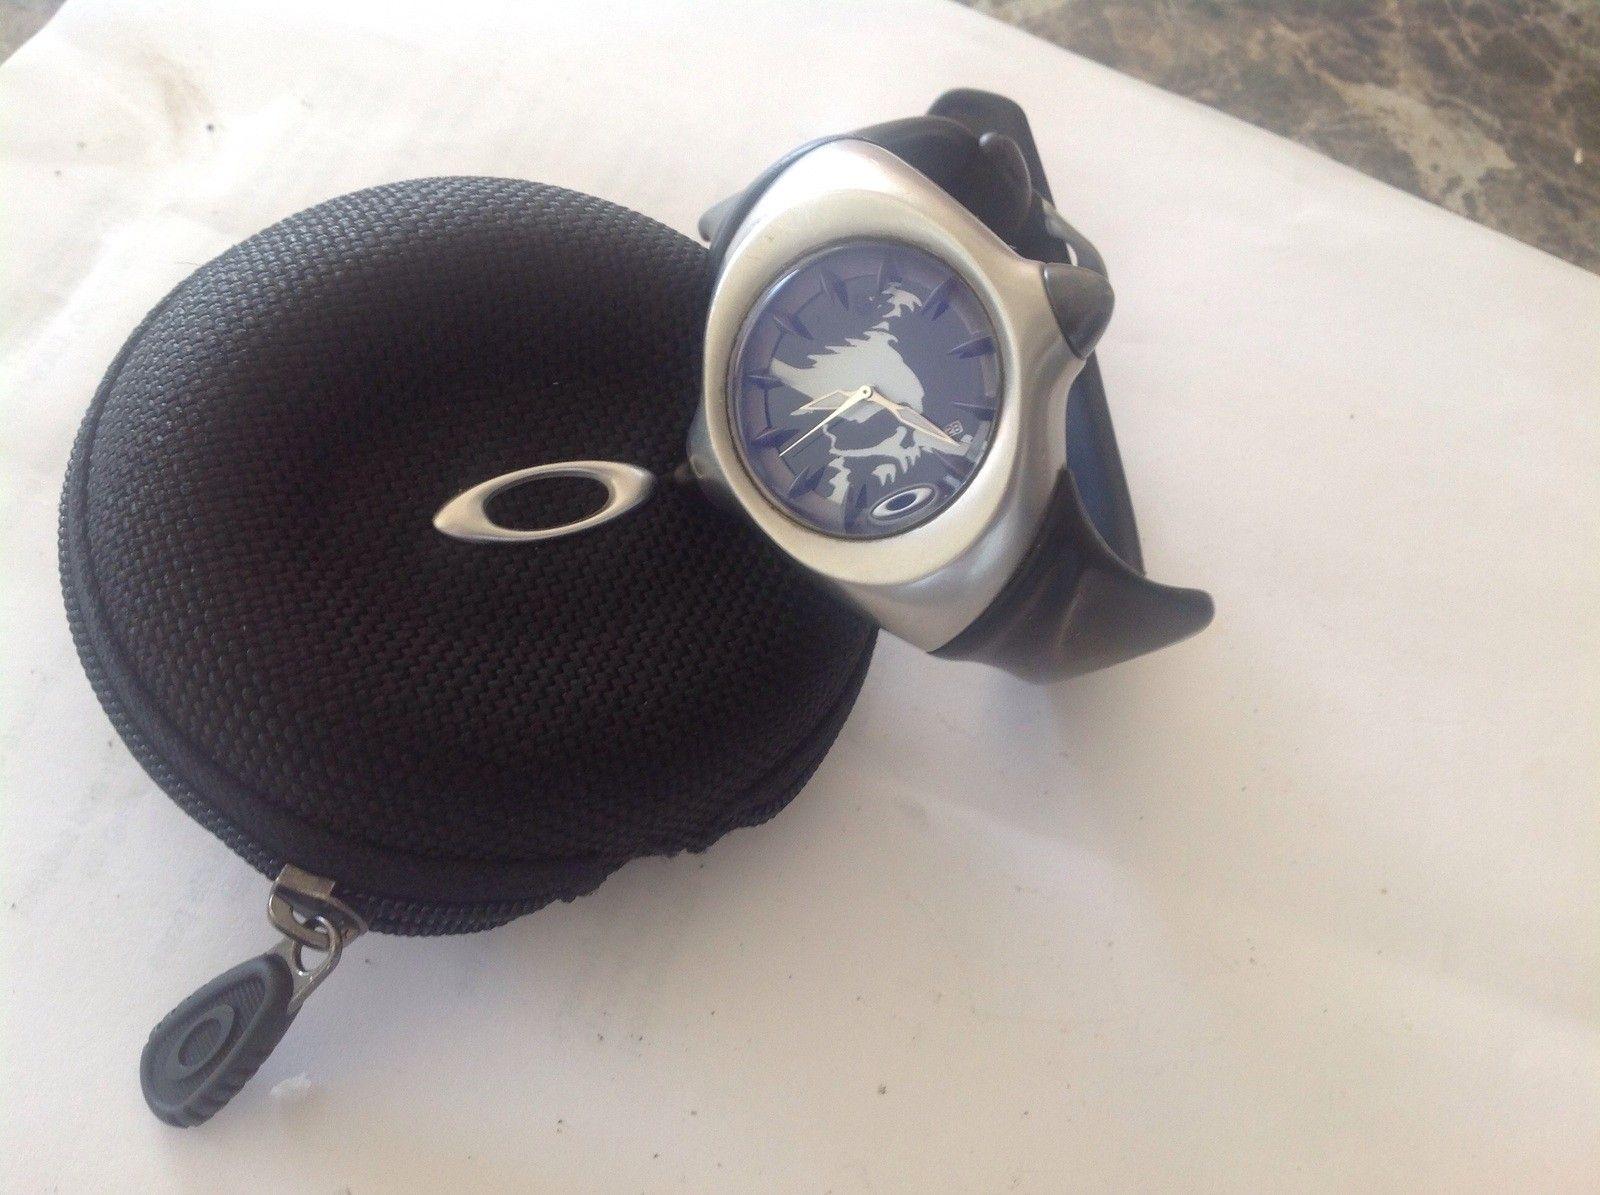 Used Oakley Crush Stainless Skull watch - image.jpg